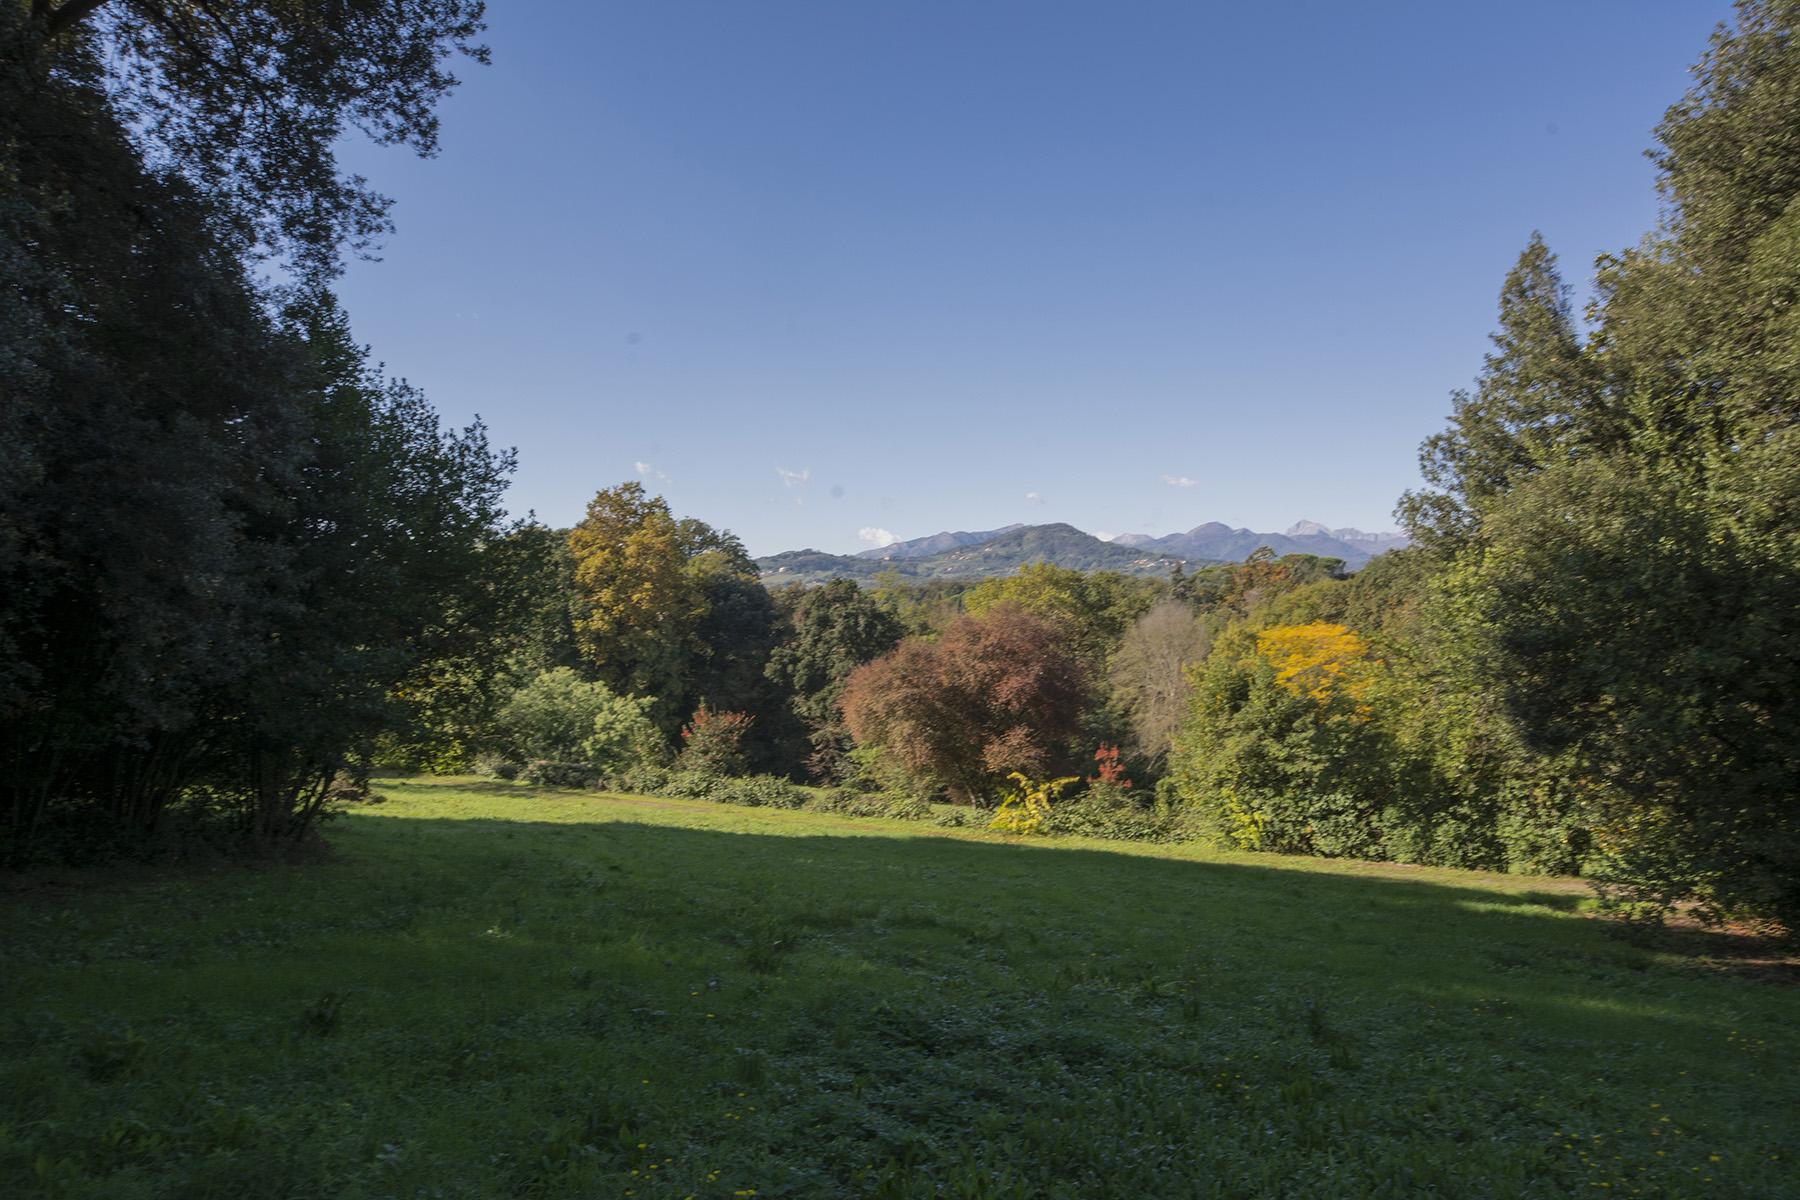 Villa in Vendita a Lucca: 5 locali, 2451 mq - Foto 20